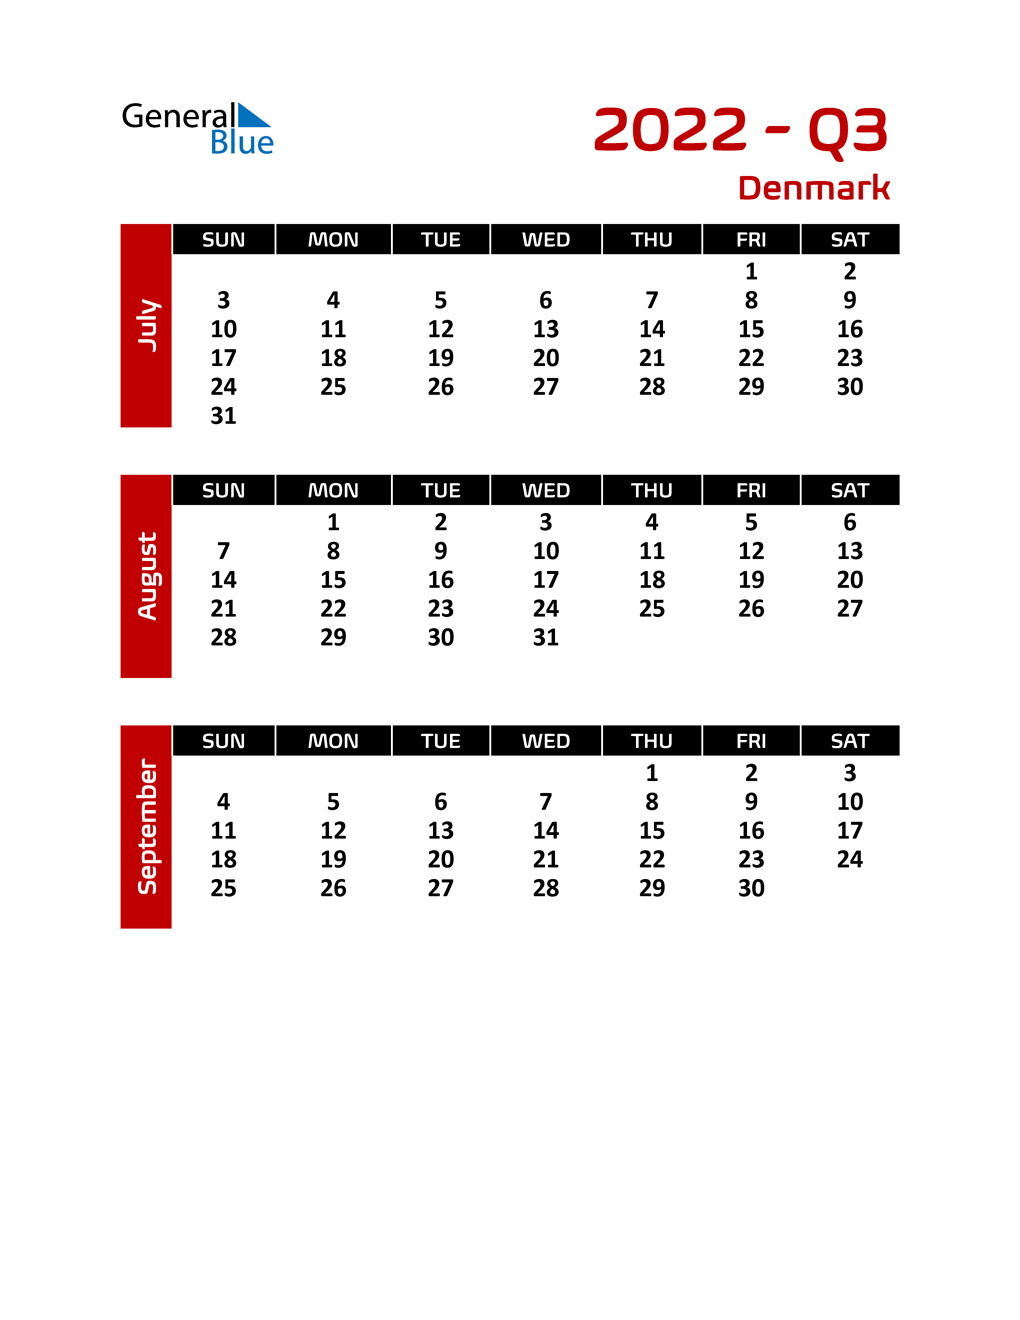 Q3 2022 Calendar with Holidays